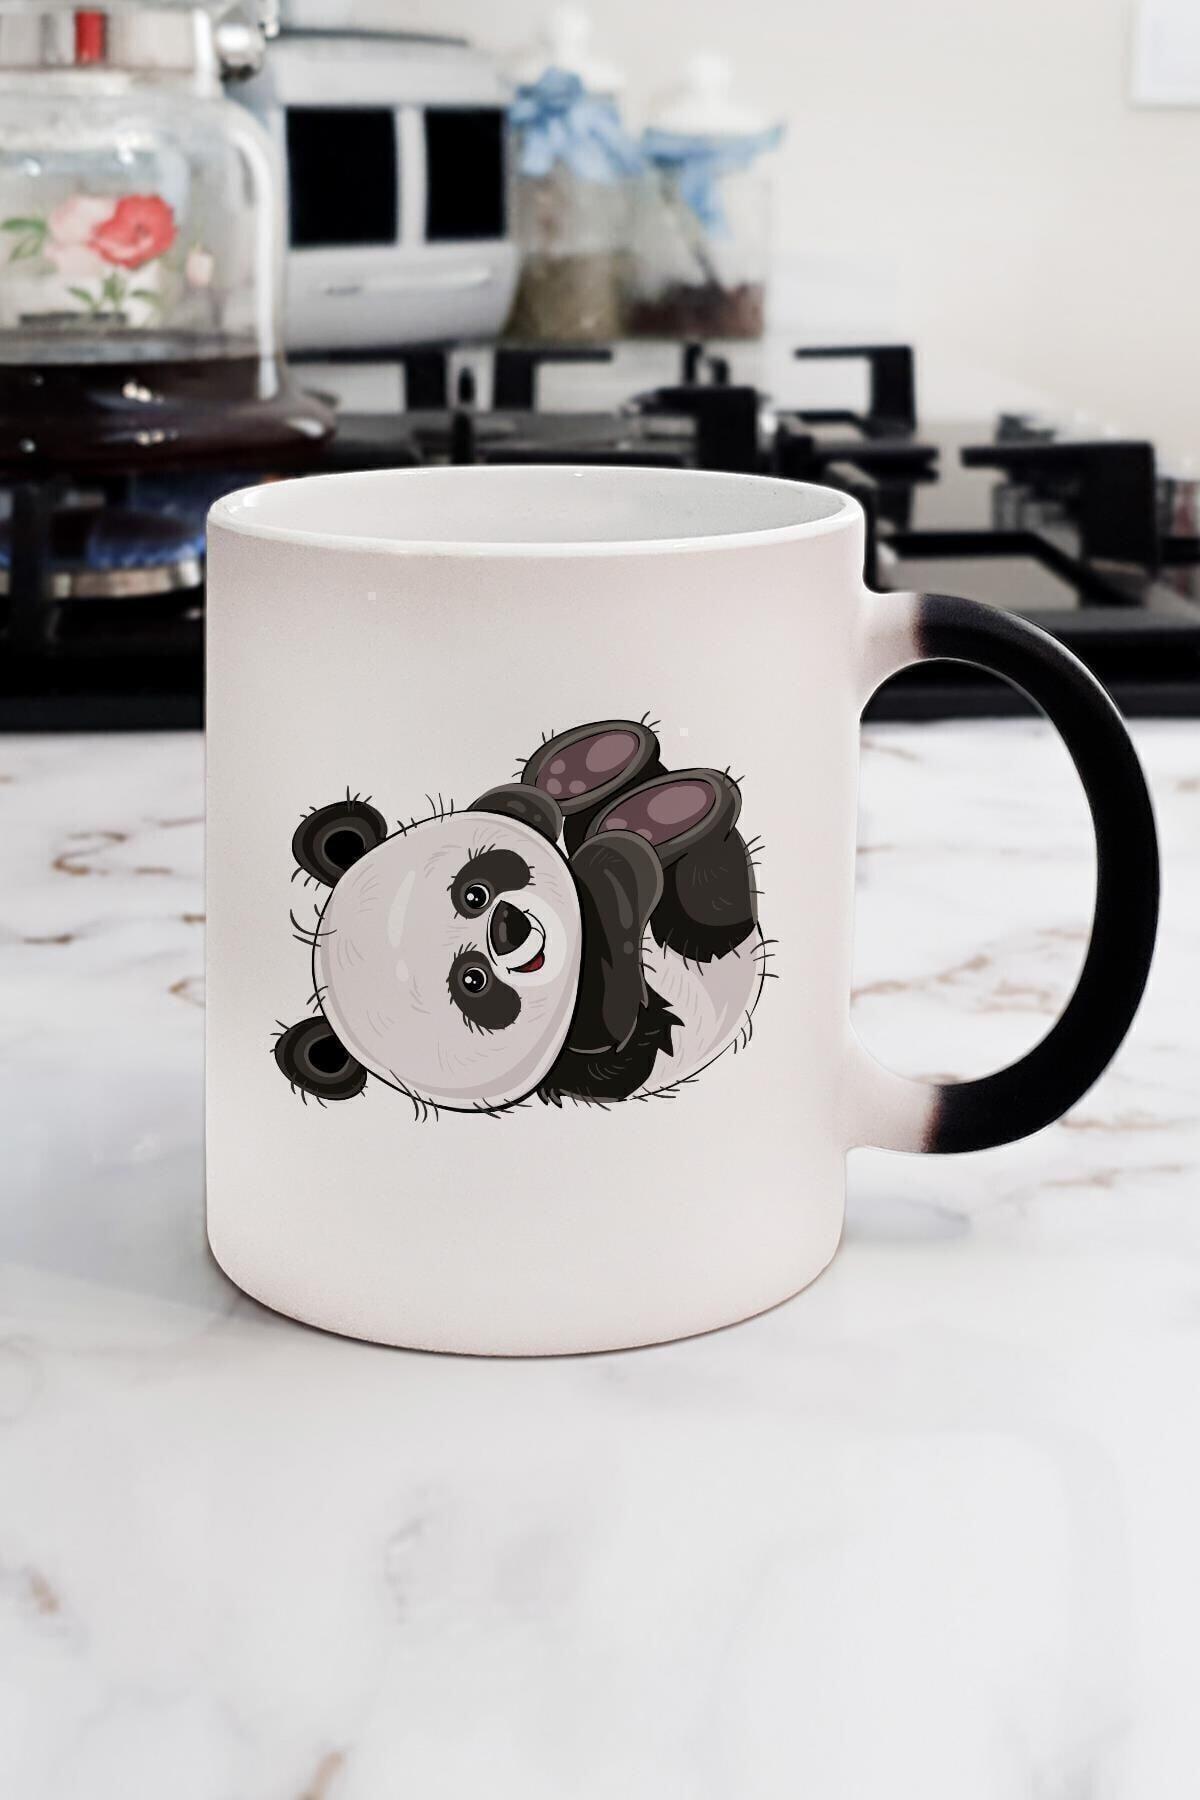 Yaprak Hediyelik Sevimli Panda Sihirli Kupa Bardak 2